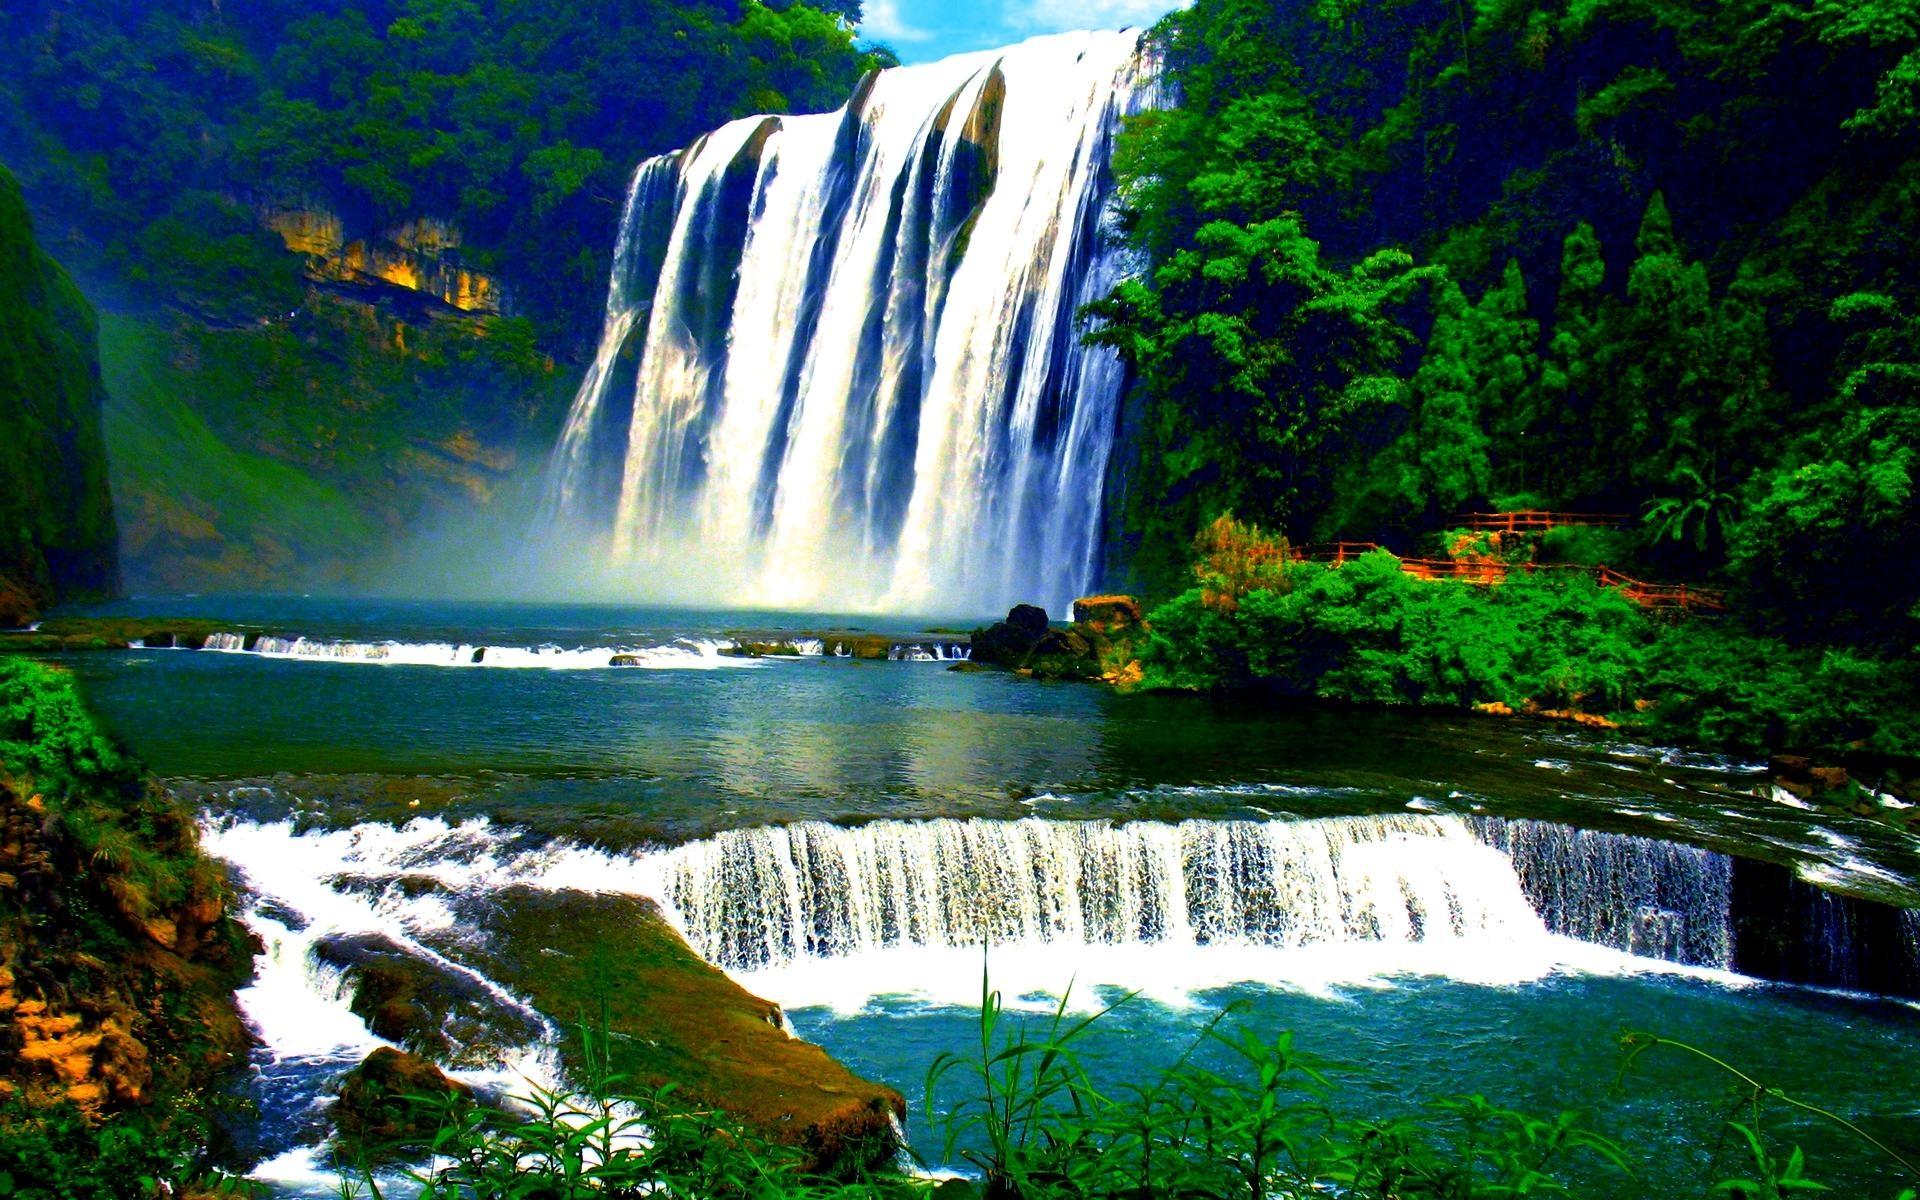 Rain Forest Waterfalls Wallpaper